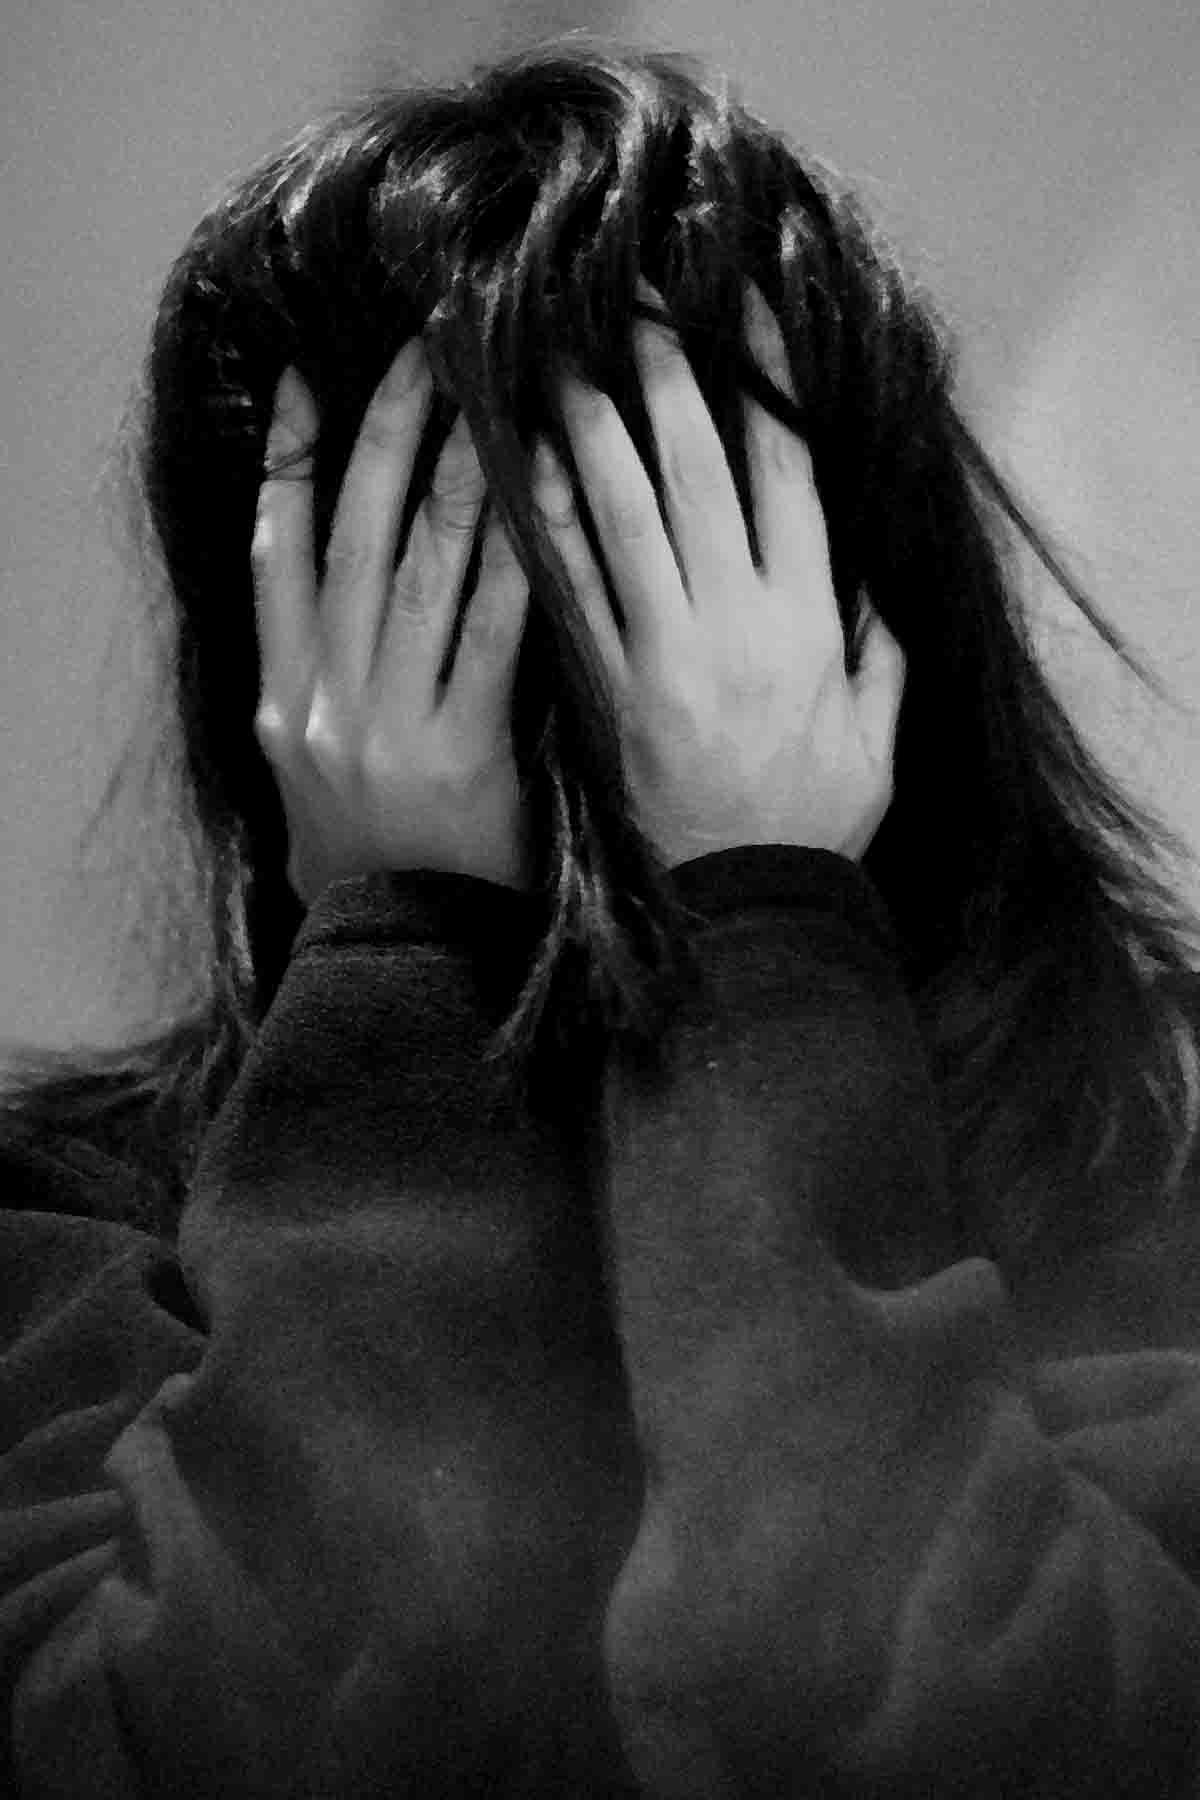 Sad: It's Either Sadness Or Euphoria